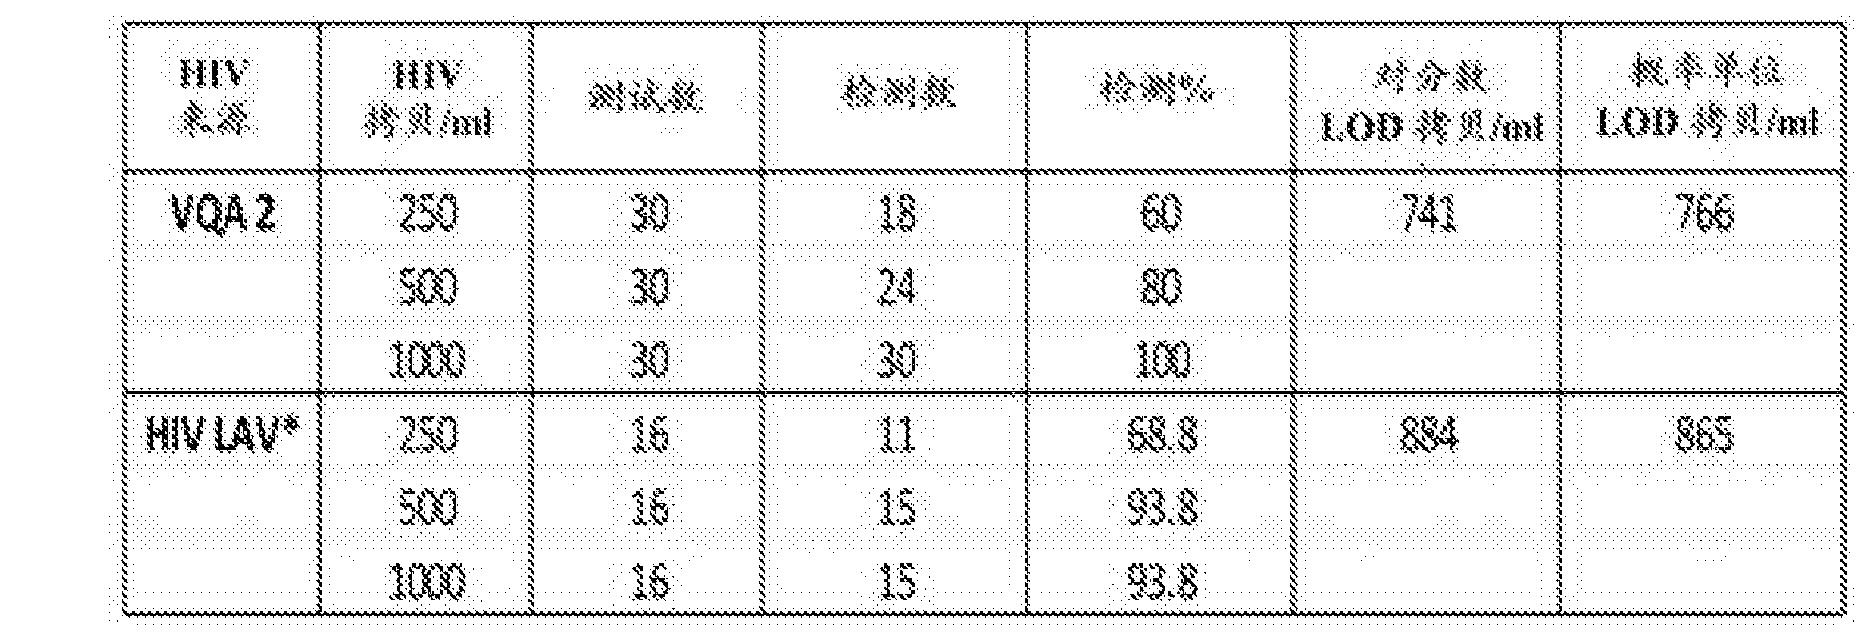 Figure CN106716140AD00201